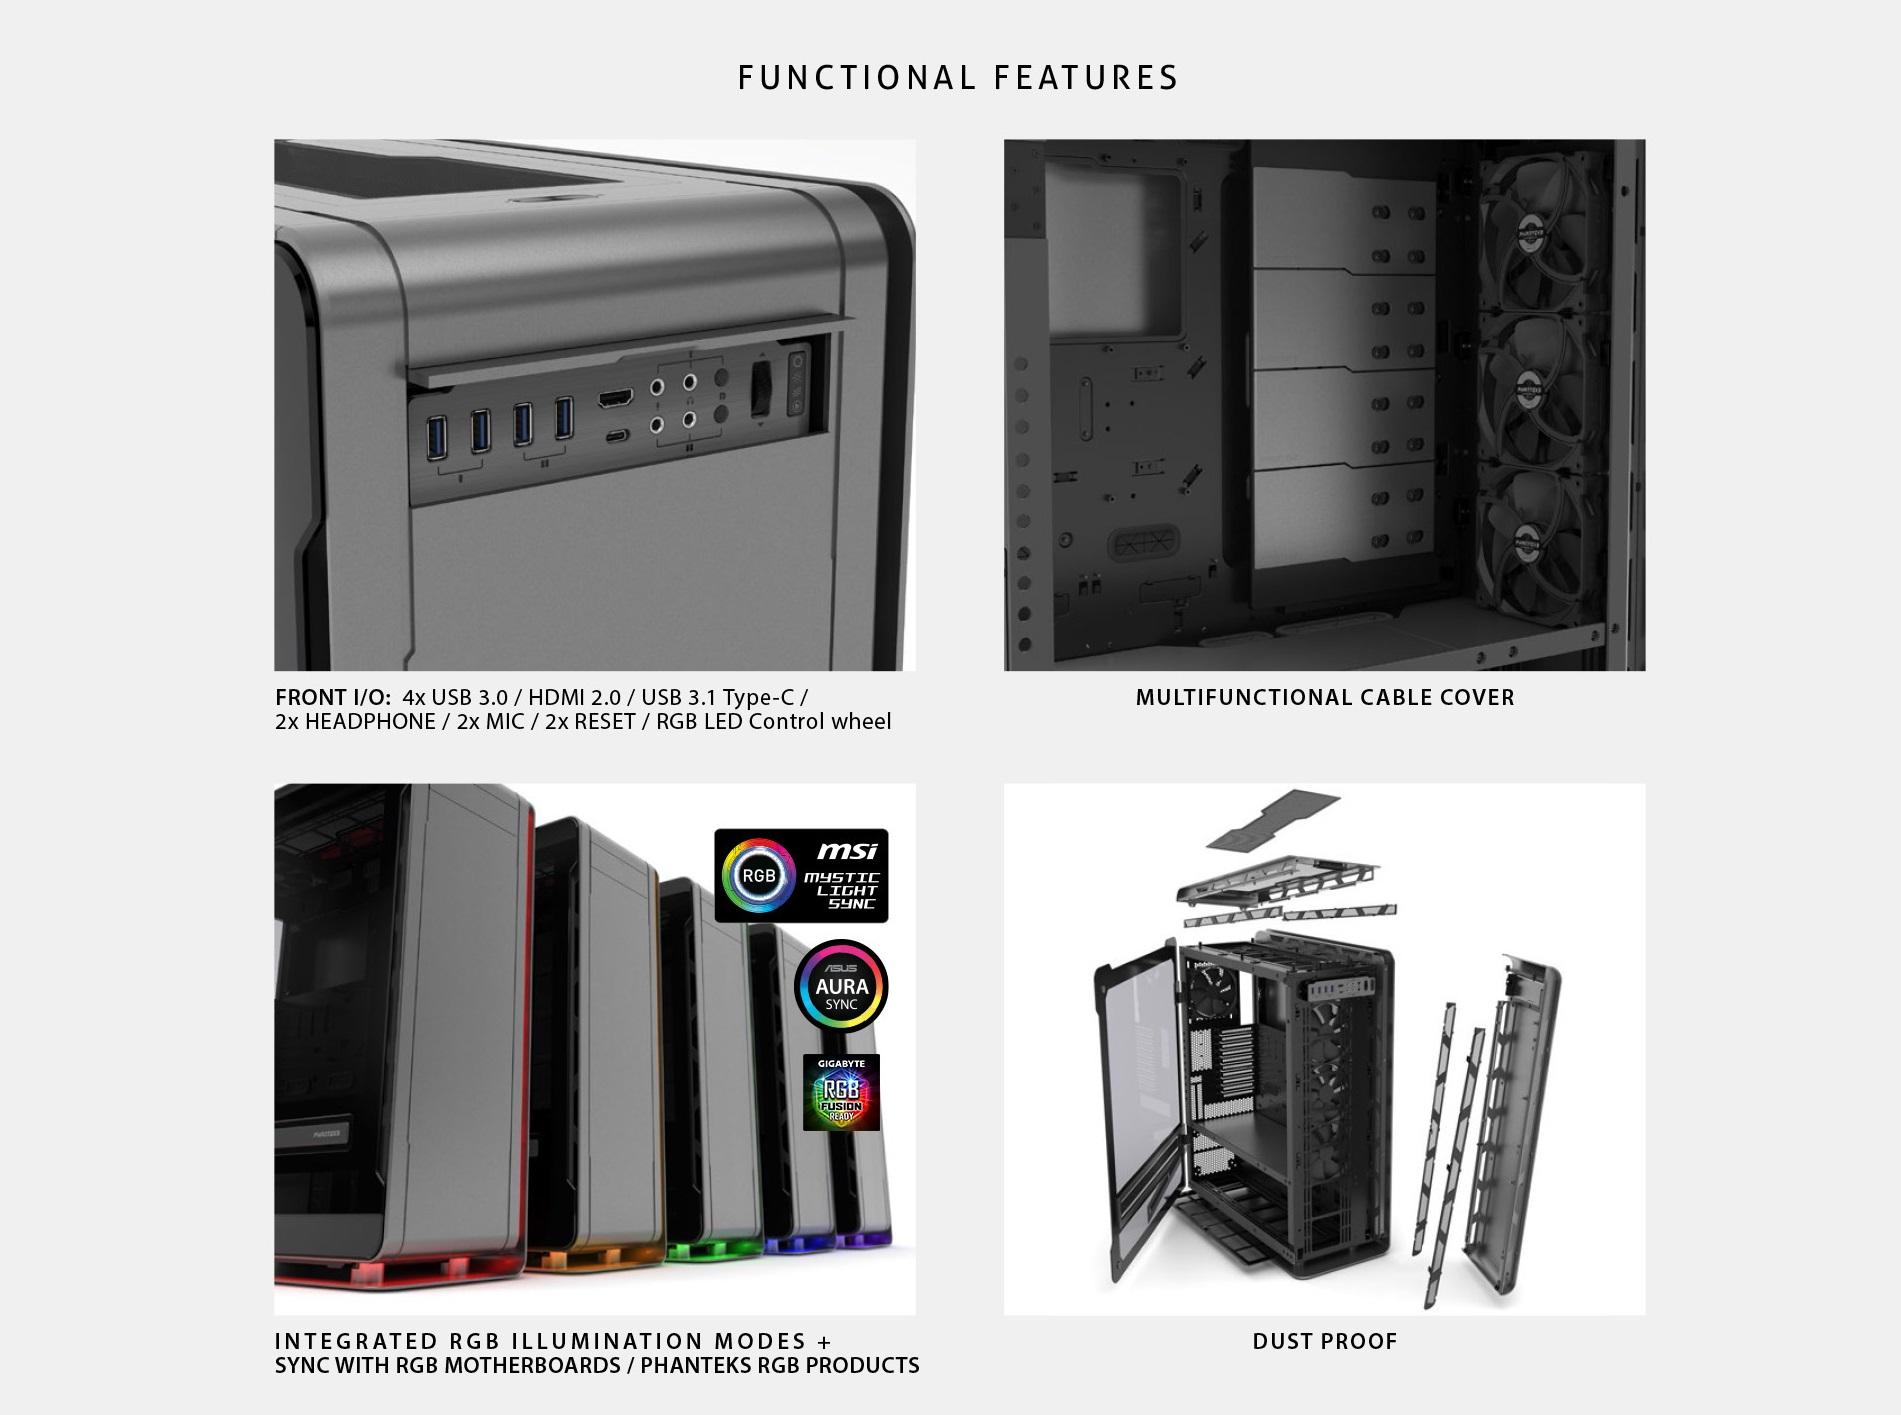 Phanteks Enthoo Elite Extreme RGB Lighting, Tempered Glass Window, Dual System Support thiết kế 3